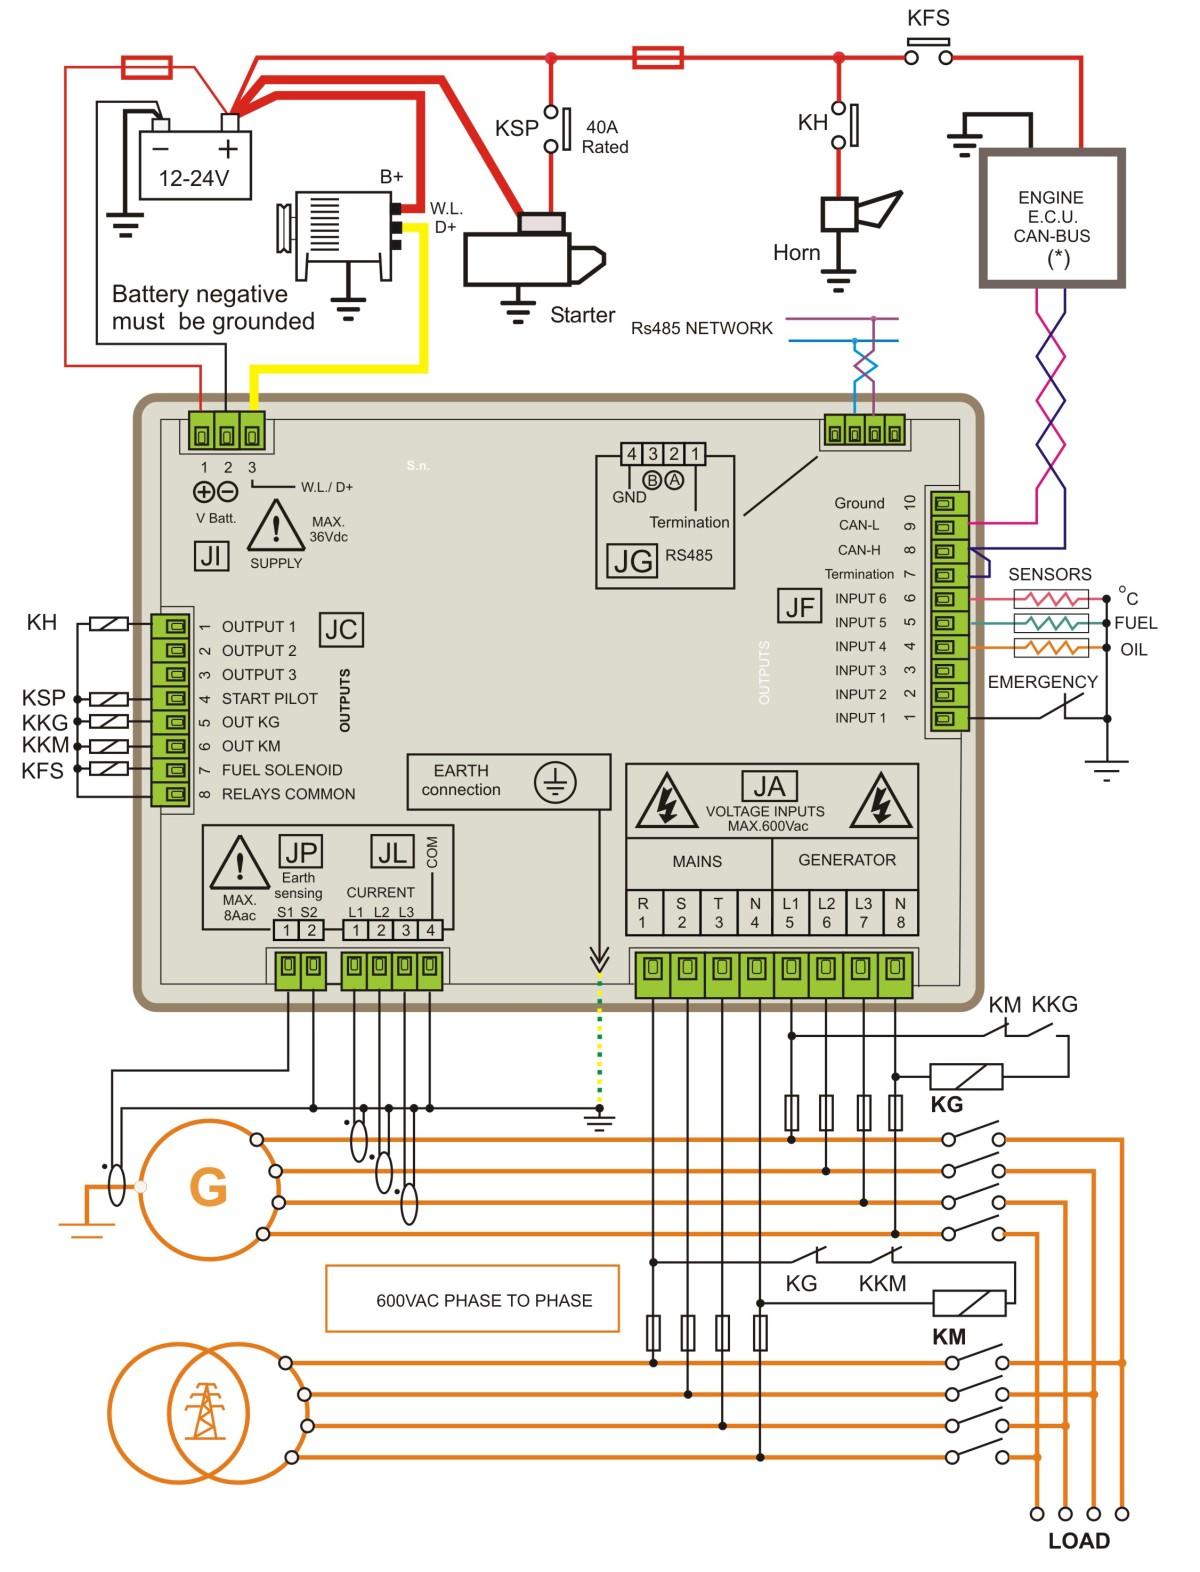 Ford 8n 12 Volt Conversion Wiring Diagram - Colakork.net